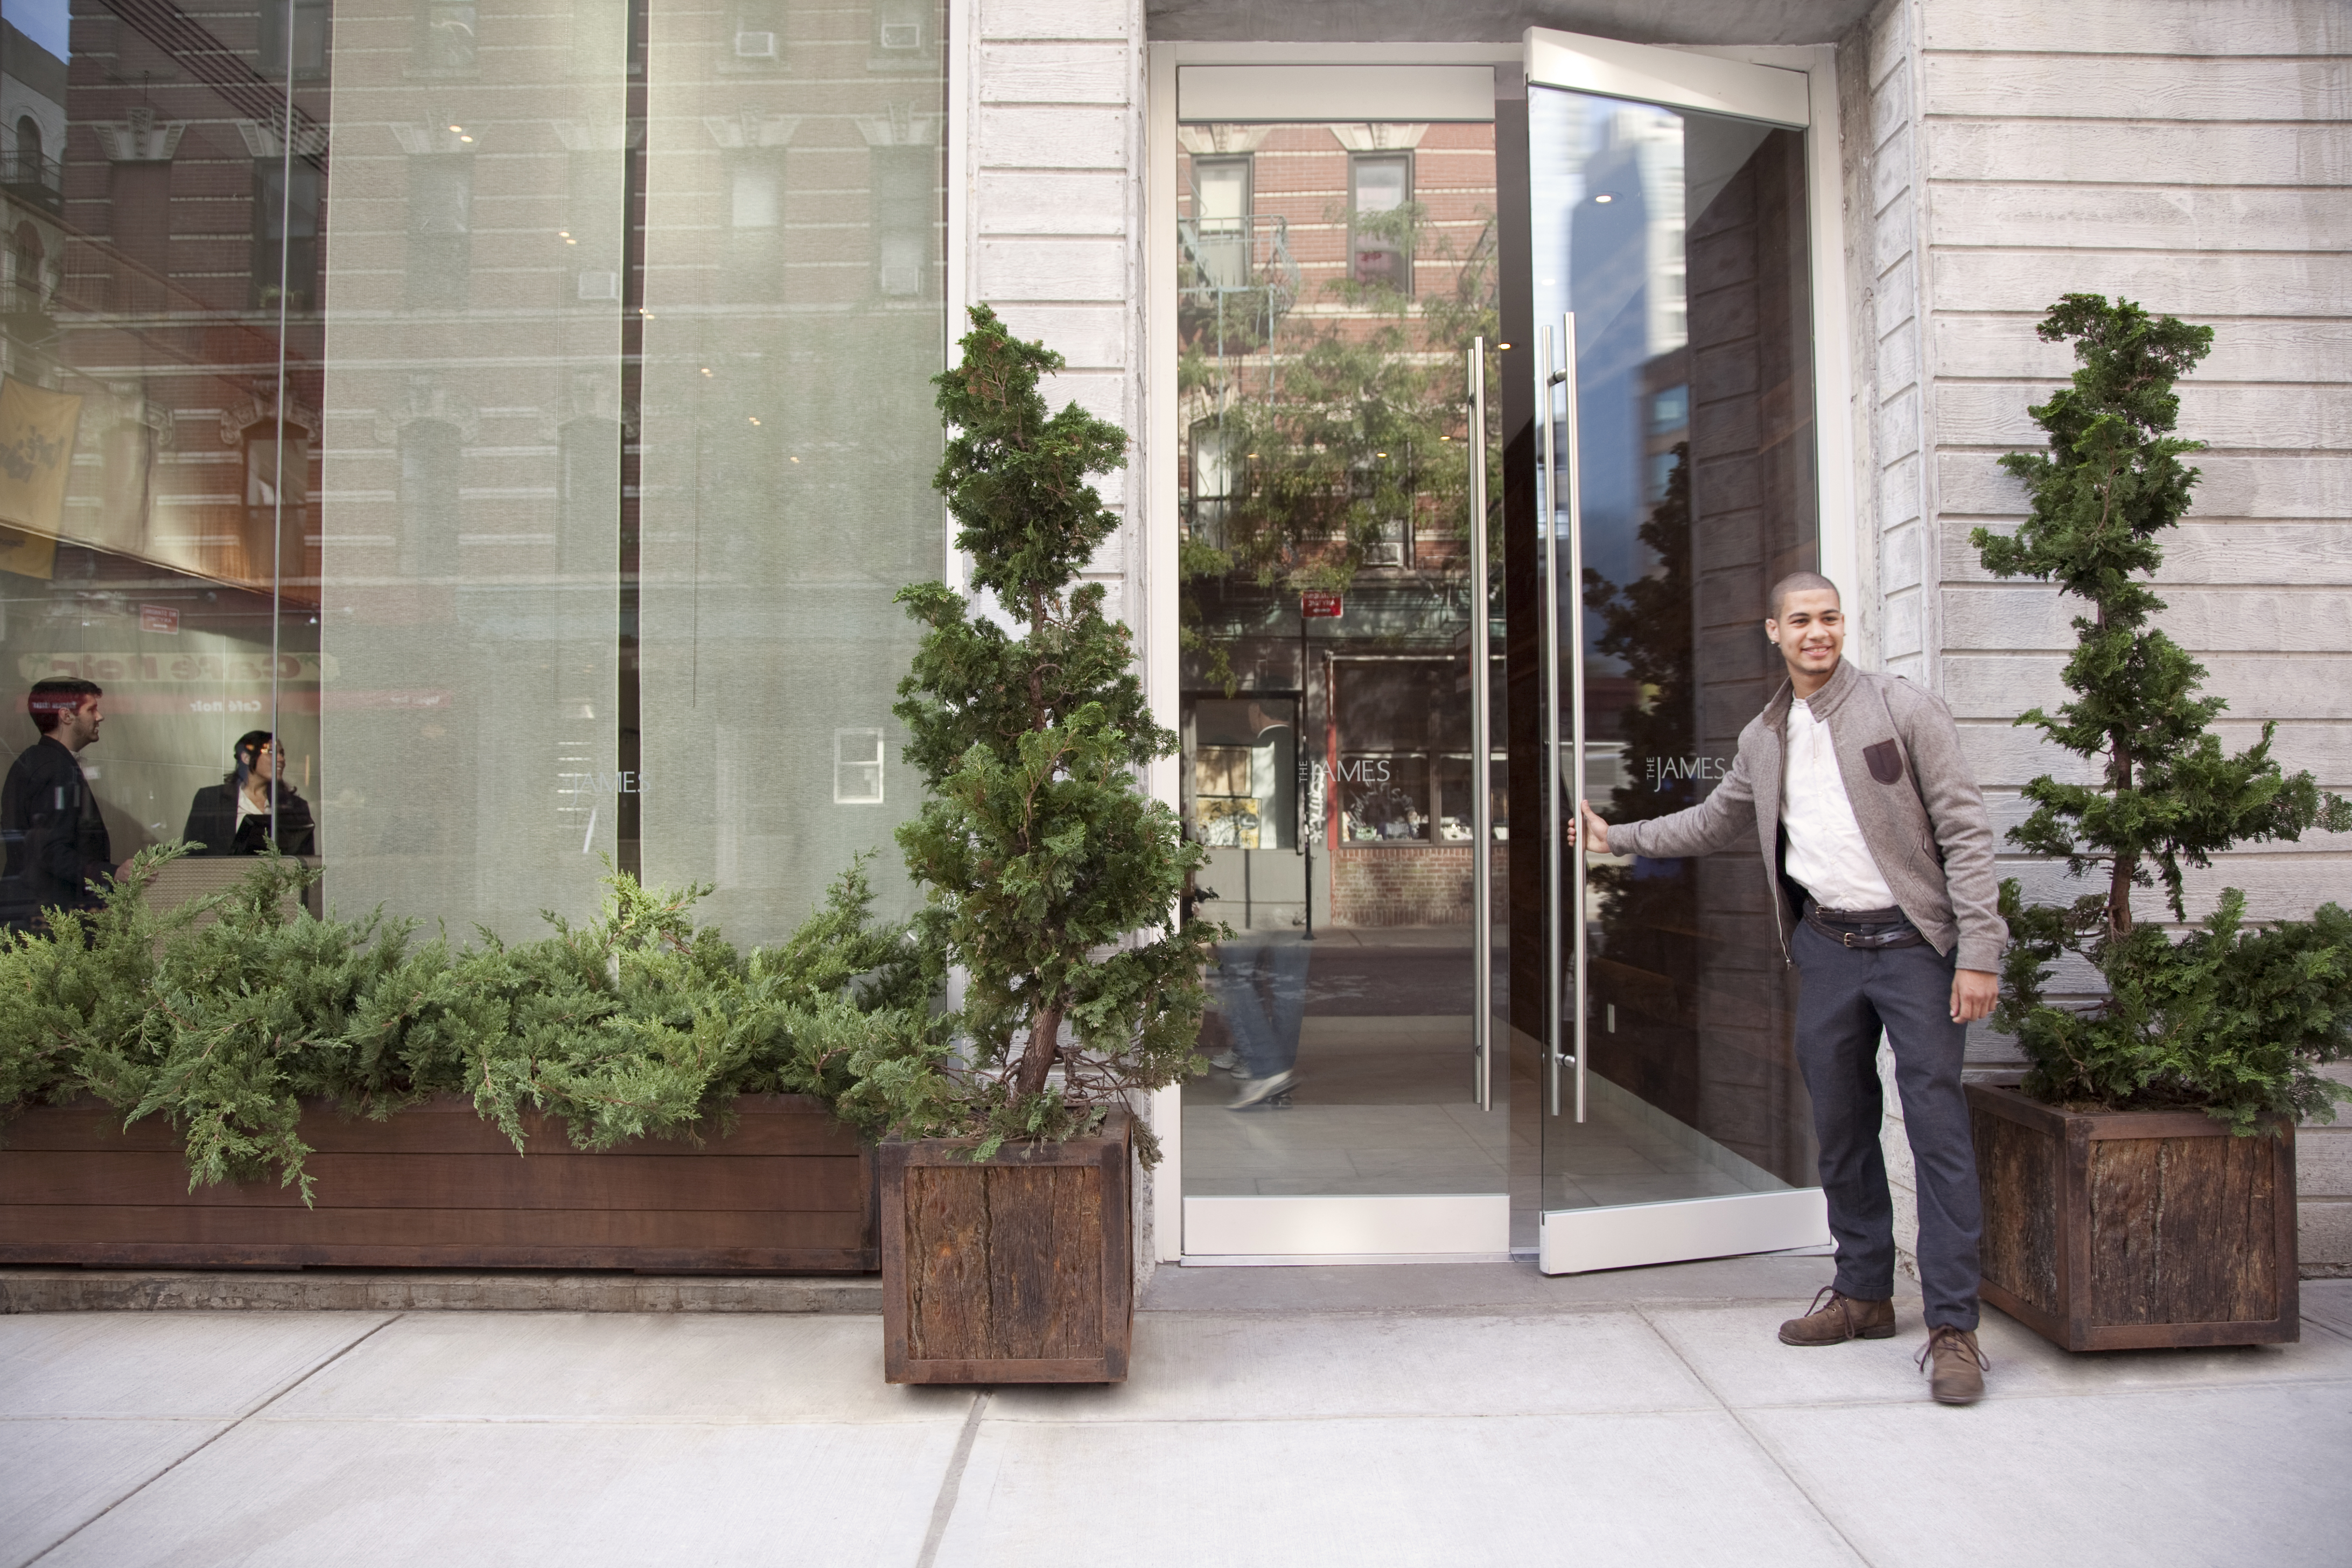 https://www.hotelsbyday.com/_data/default-hotel_image/2/13964/james-soho-entrance-1.jpg